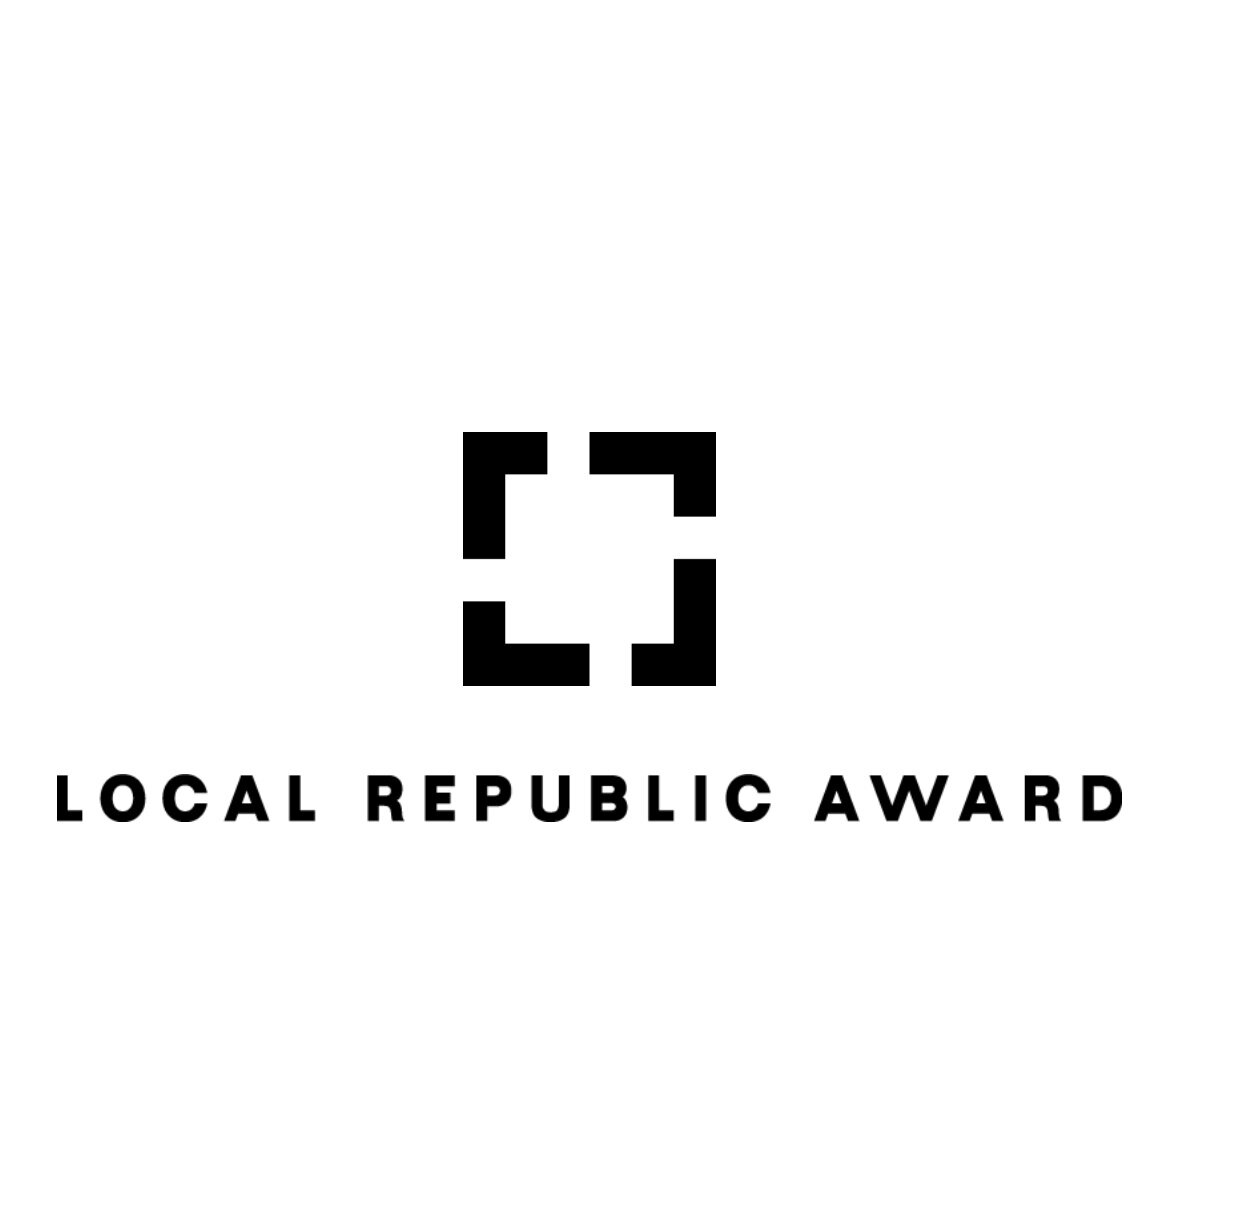 【LOCAL REPUBLIC AWARD】